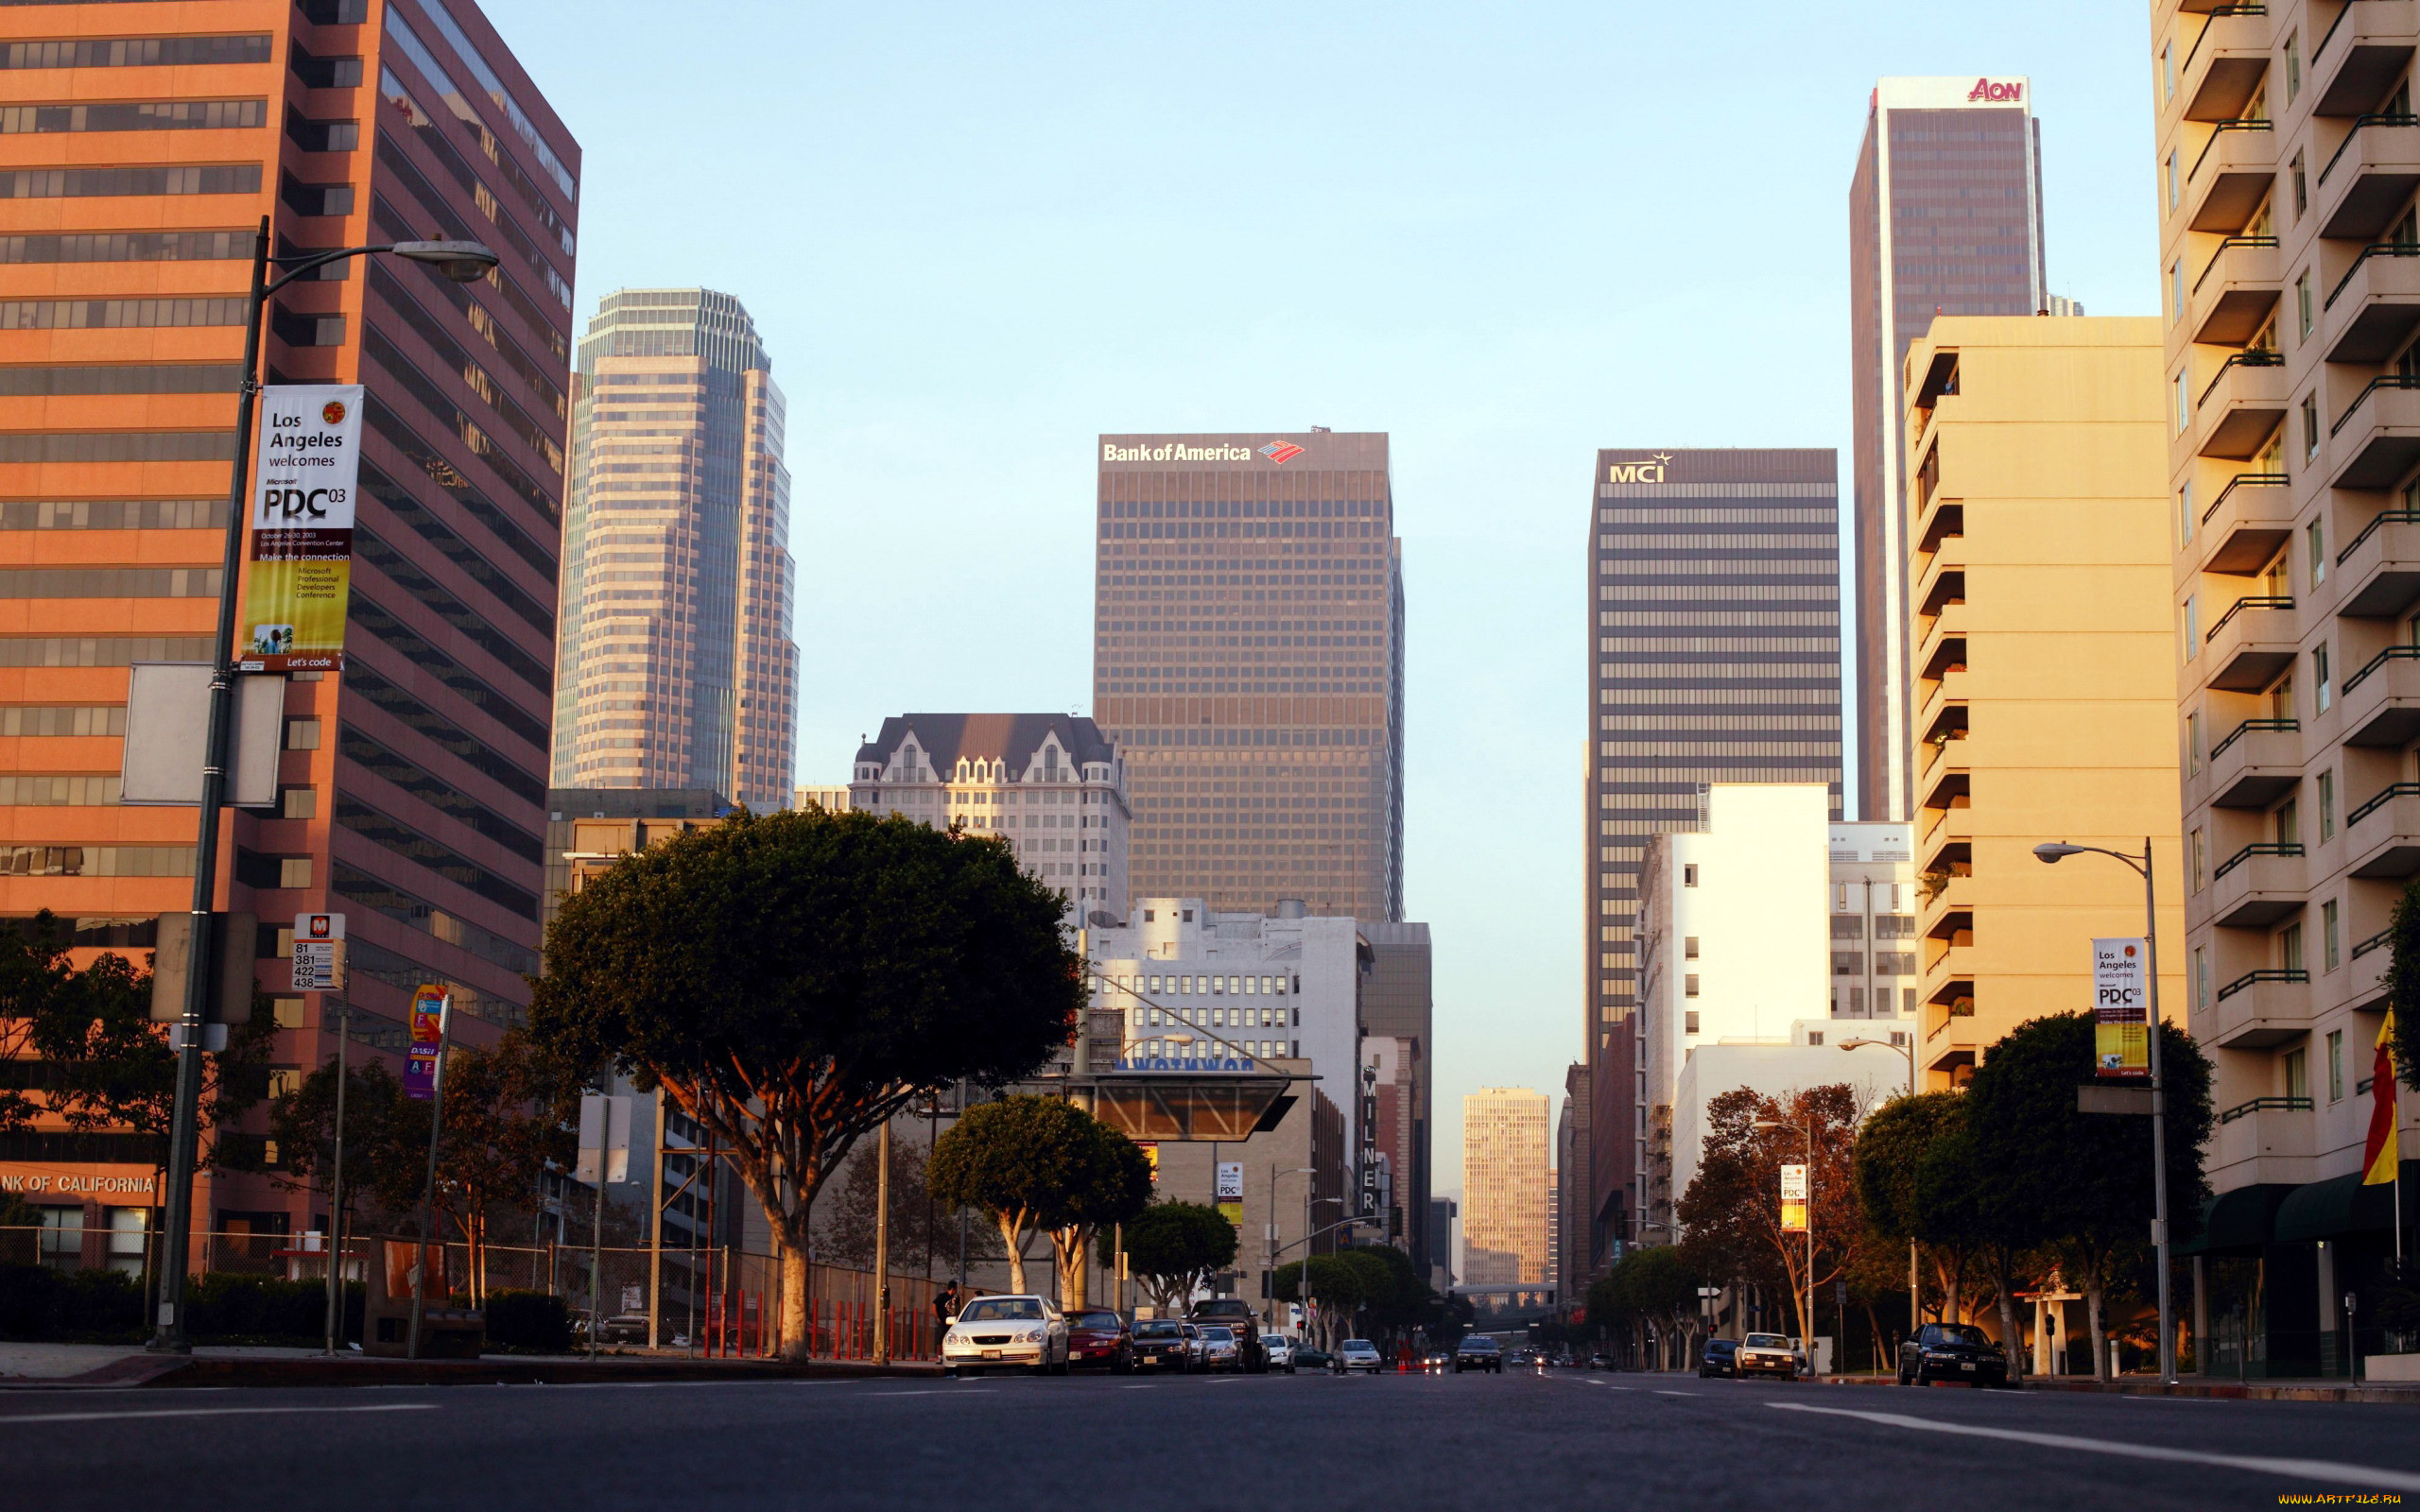 стол улицы лос анджелеса фото на рабочий стол итоге